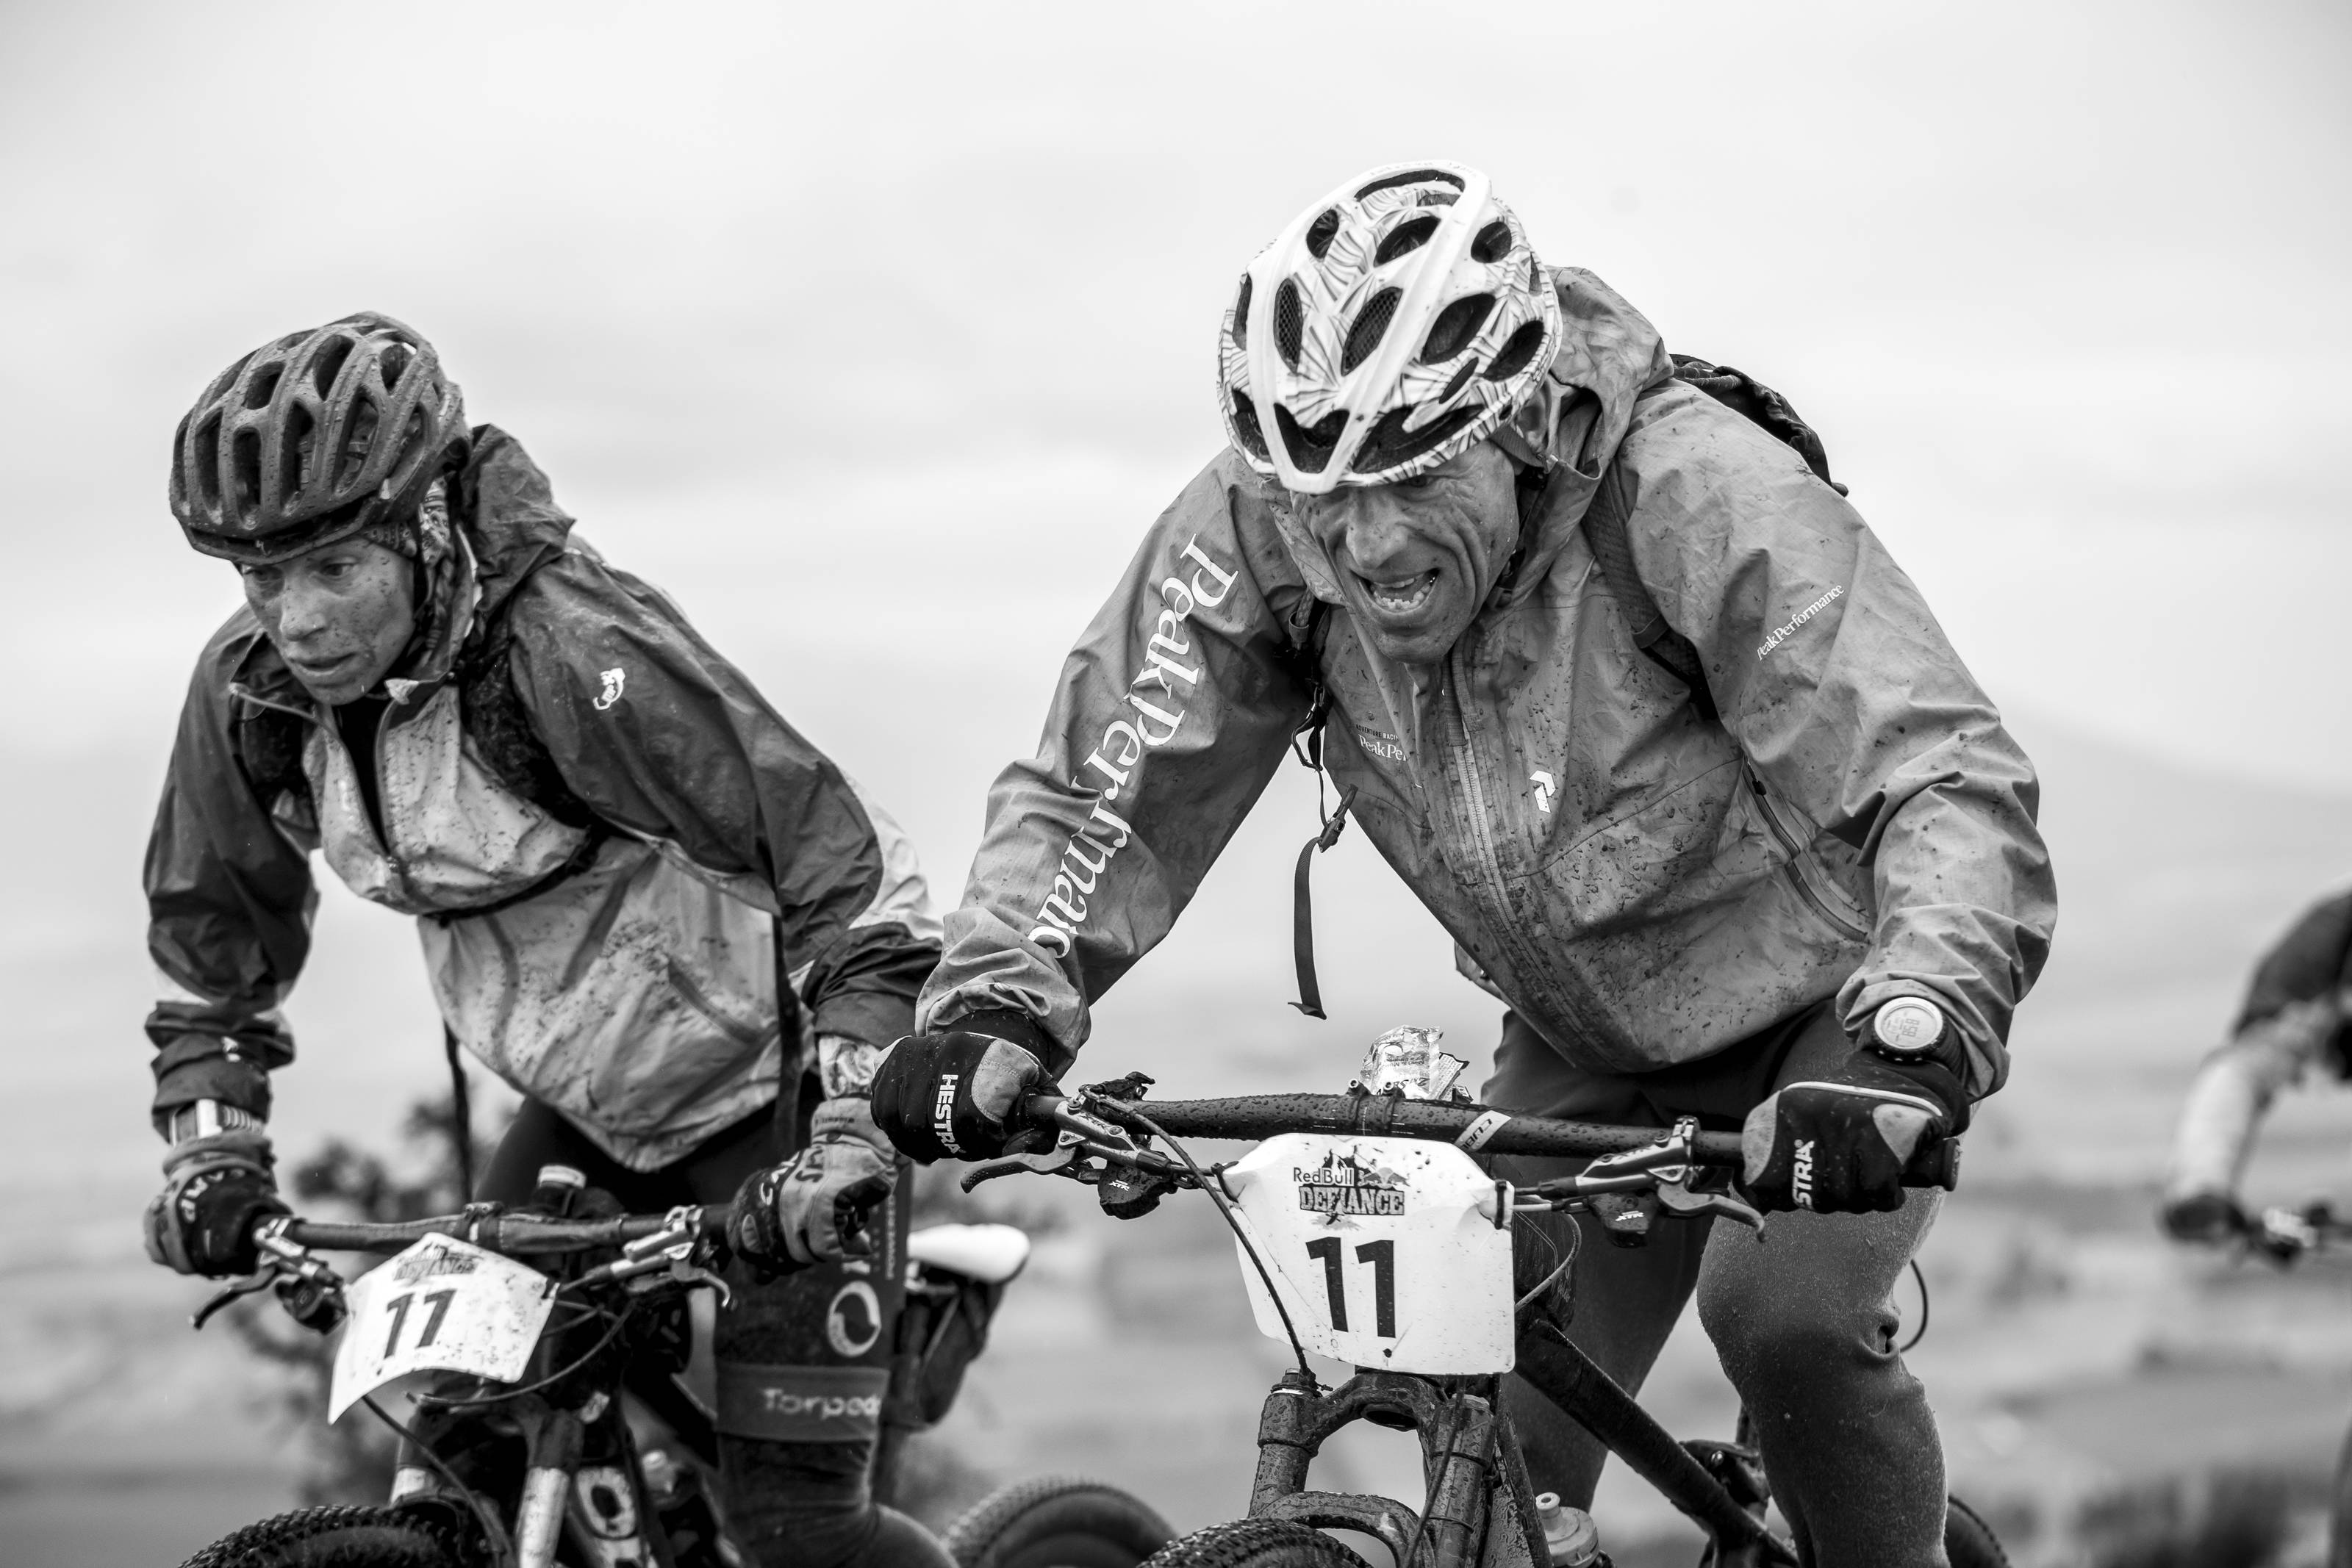 Stop Asking for Easy: A Manifesto for Doing Hard Things Voluntarily - Singletracks Mountain Bike News